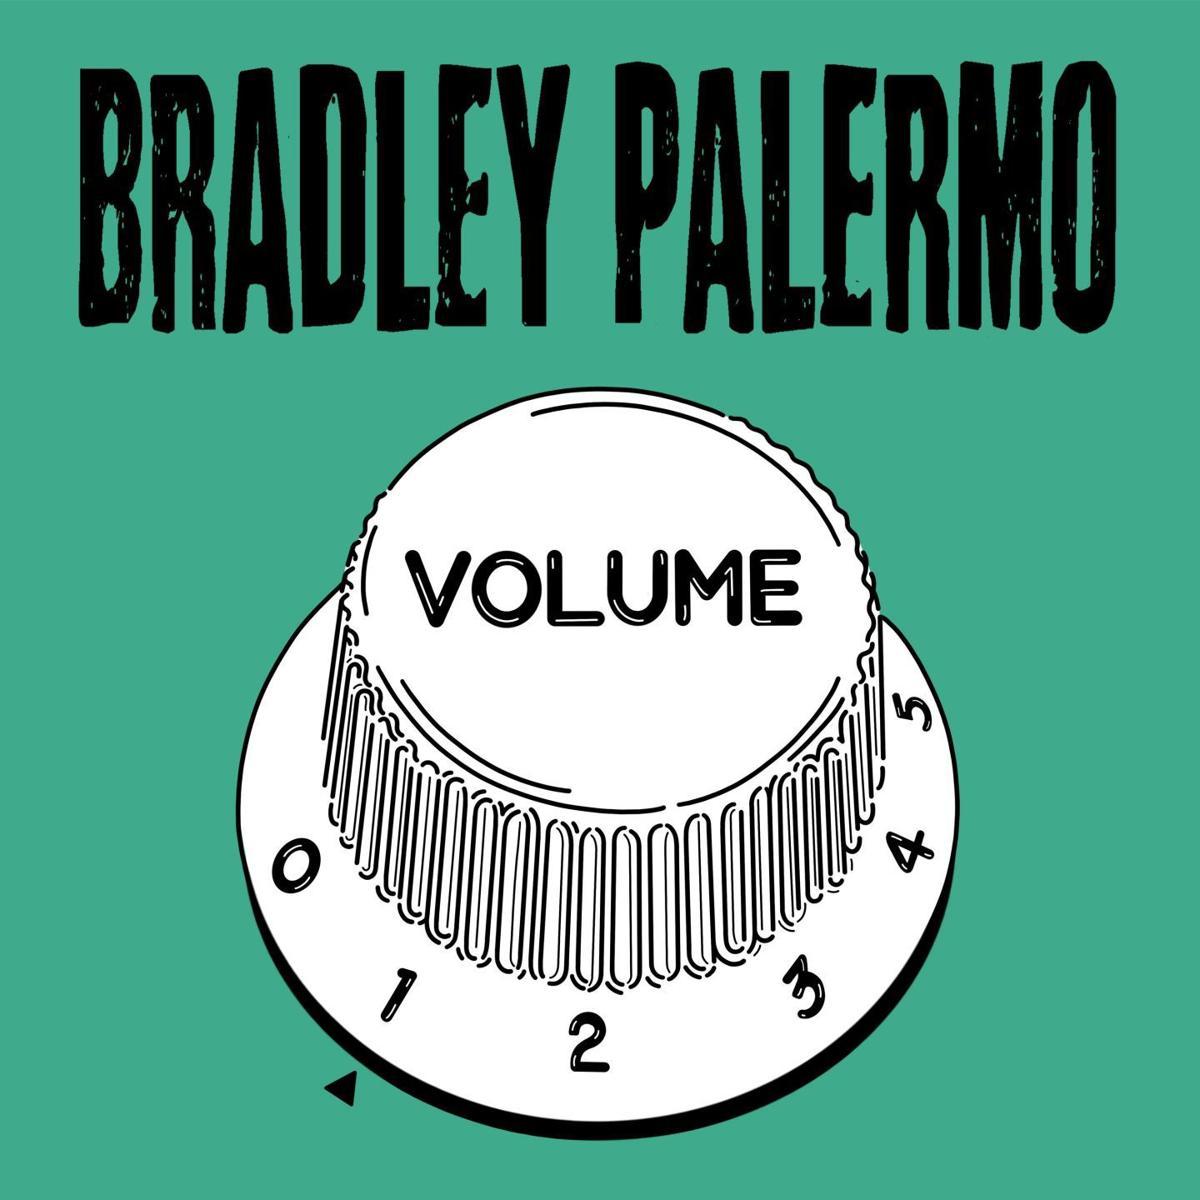 Bradley Palermo, Vol. 1 - Bradley Palermo